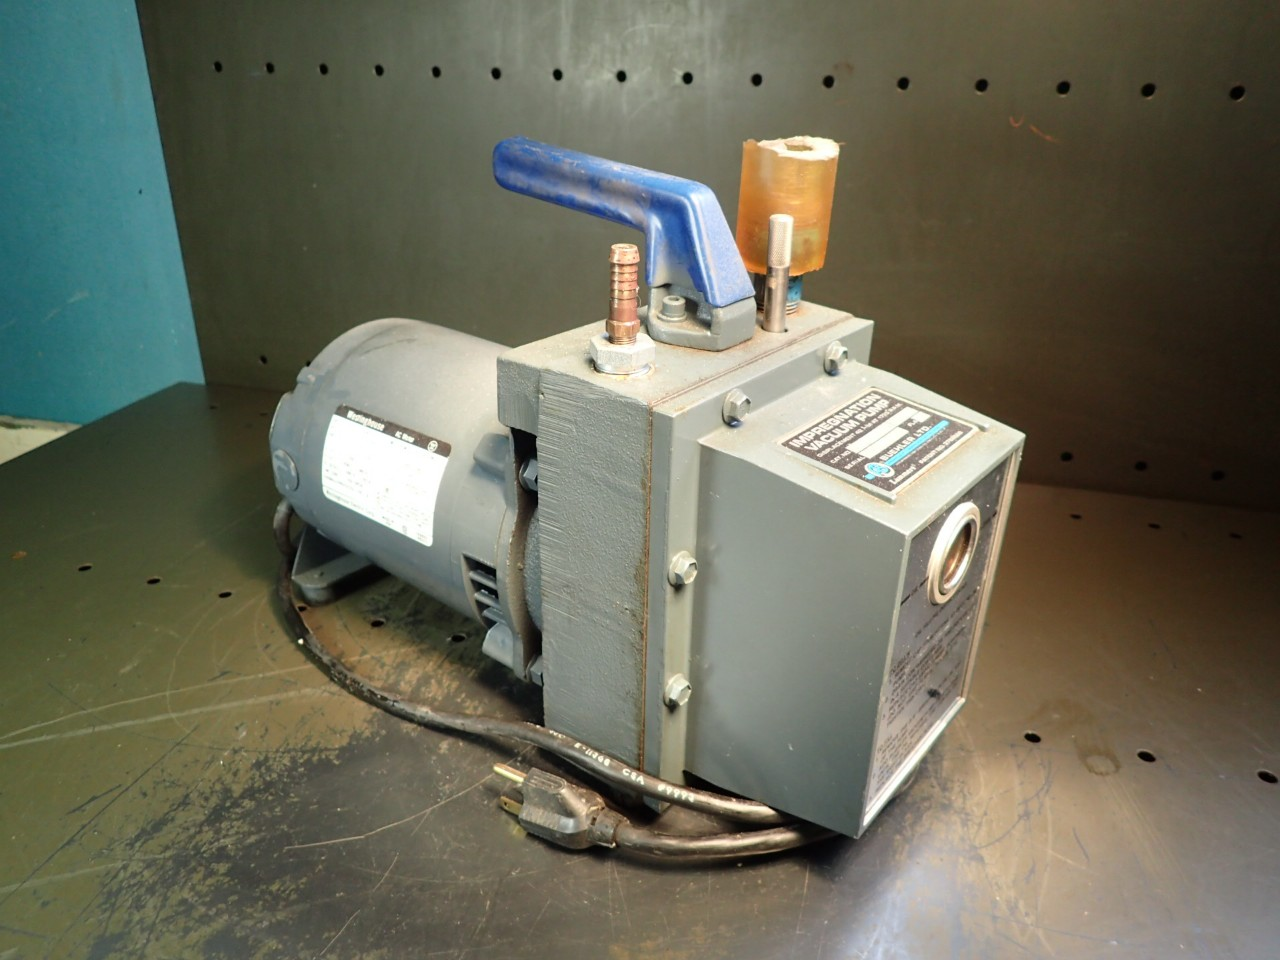 Buehler 20-2850 Impregnation Vacuum Pump: Westinghouse, 115V, 1/3HP, Motor, Used